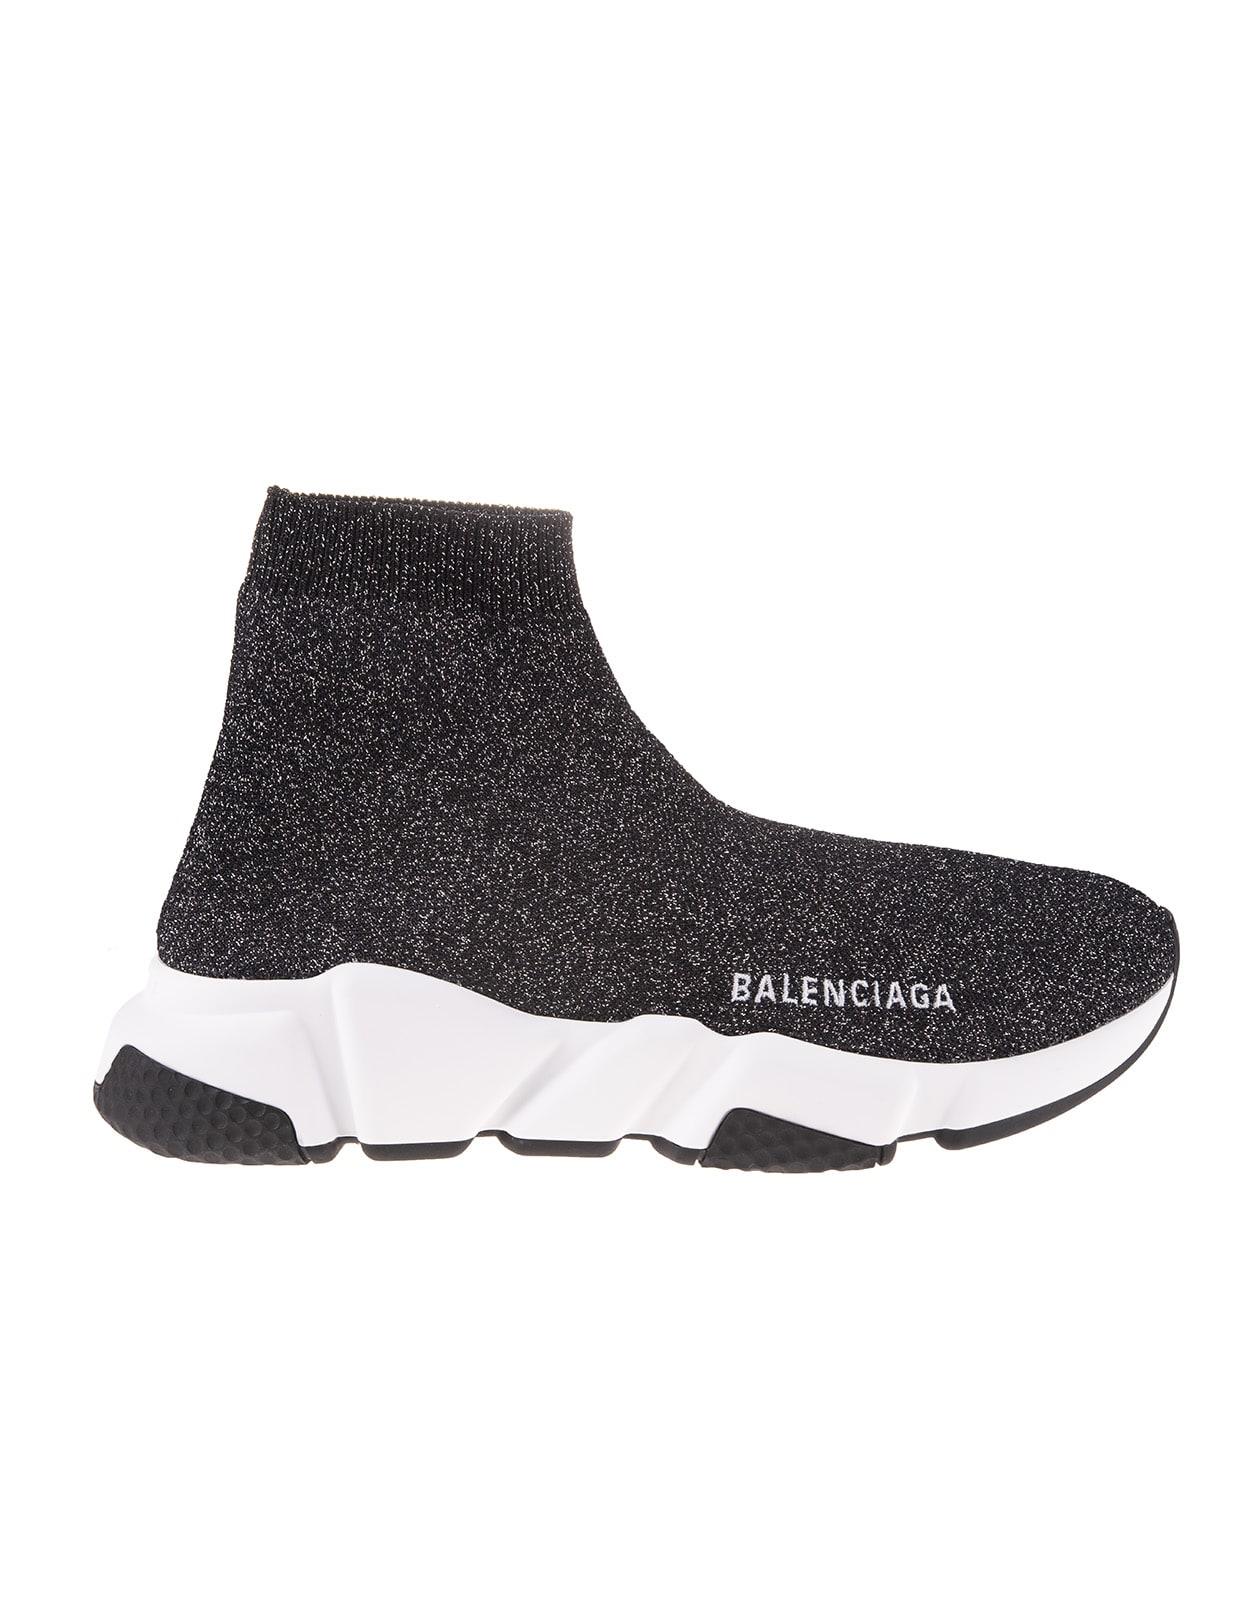 Buy Balenciaga Woman Speed Sneakers In Black-silver Lurex online, shop Balenciaga shoes with free shipping